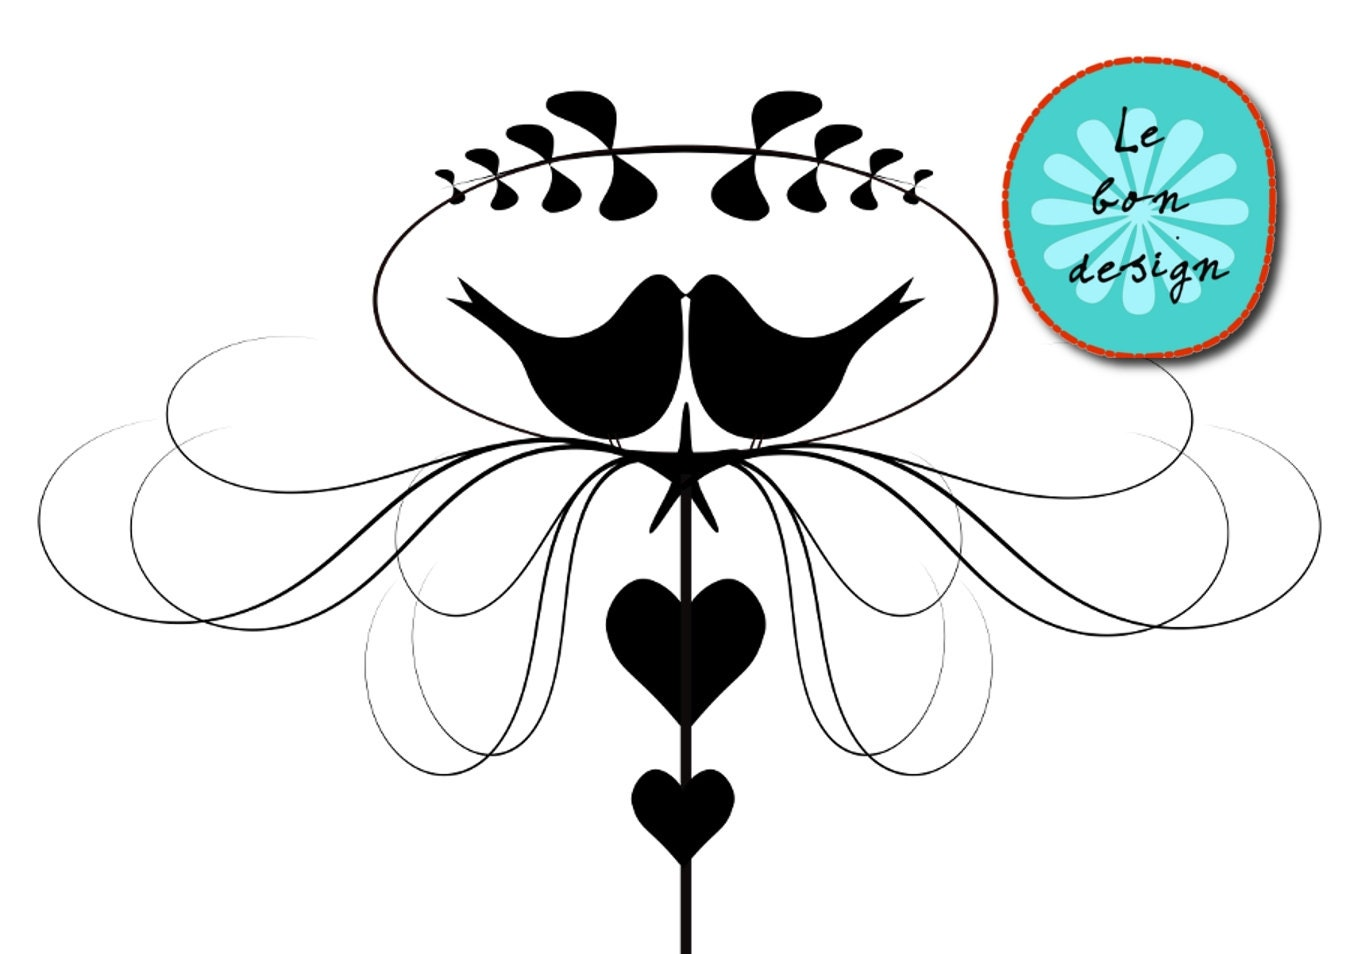 Clip art love birds vector wedding invitation by Lebondesign